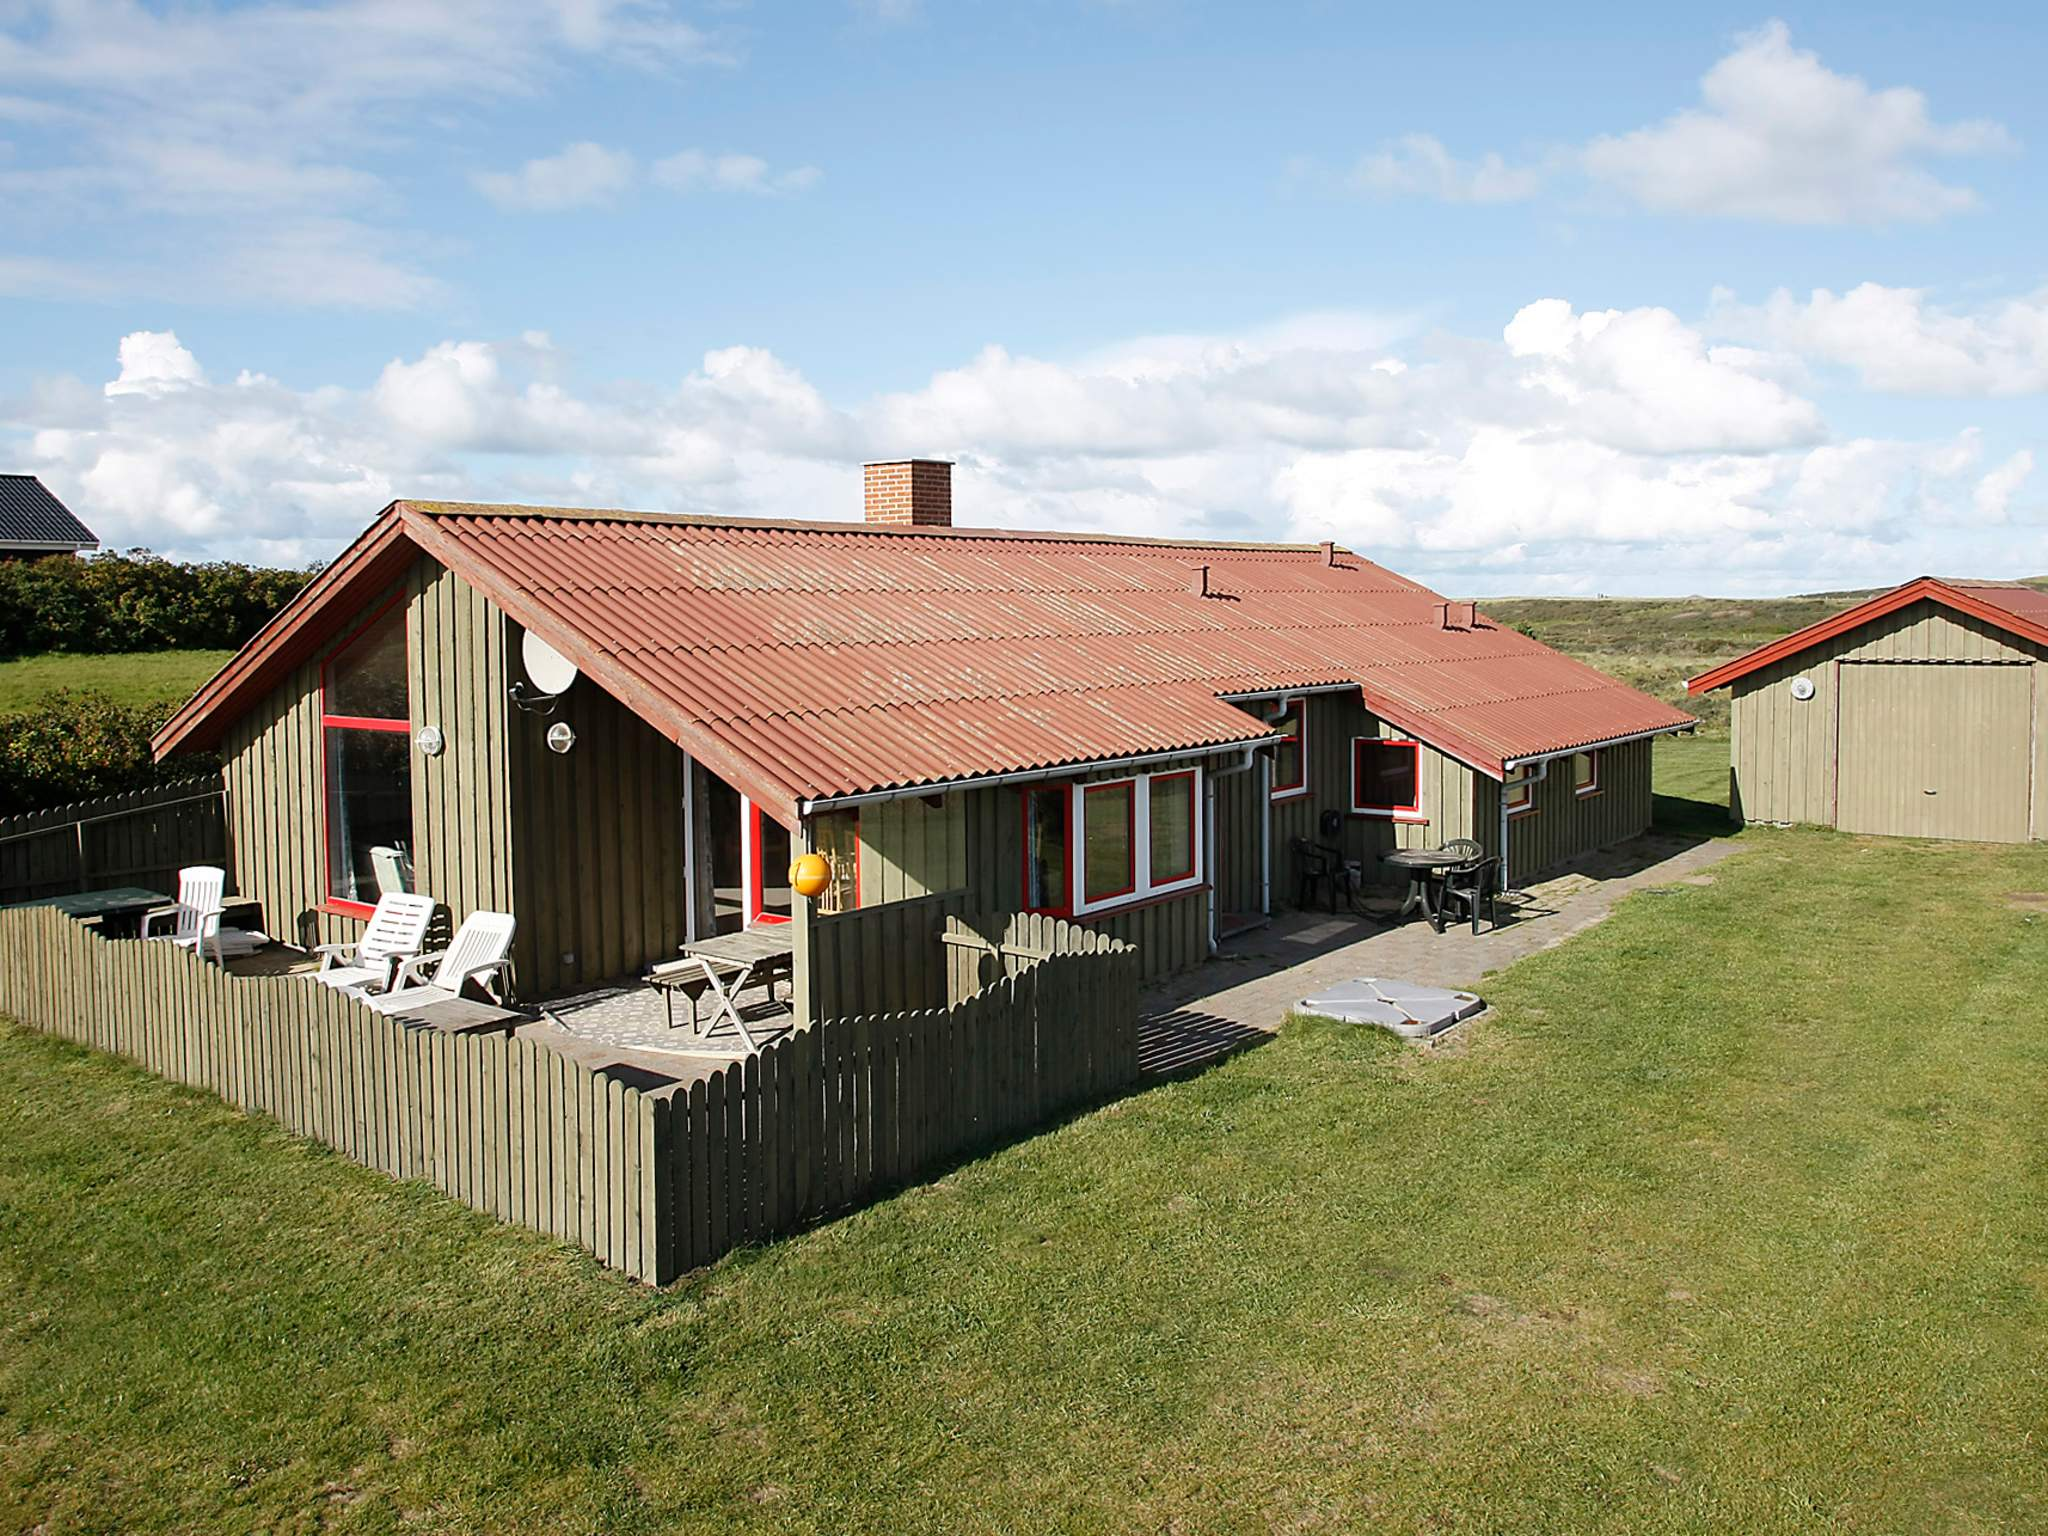 Ferienhaus Nr. Lyngby (335283), Løkken, , Nordwestjütland, Dänemark, Bild 1